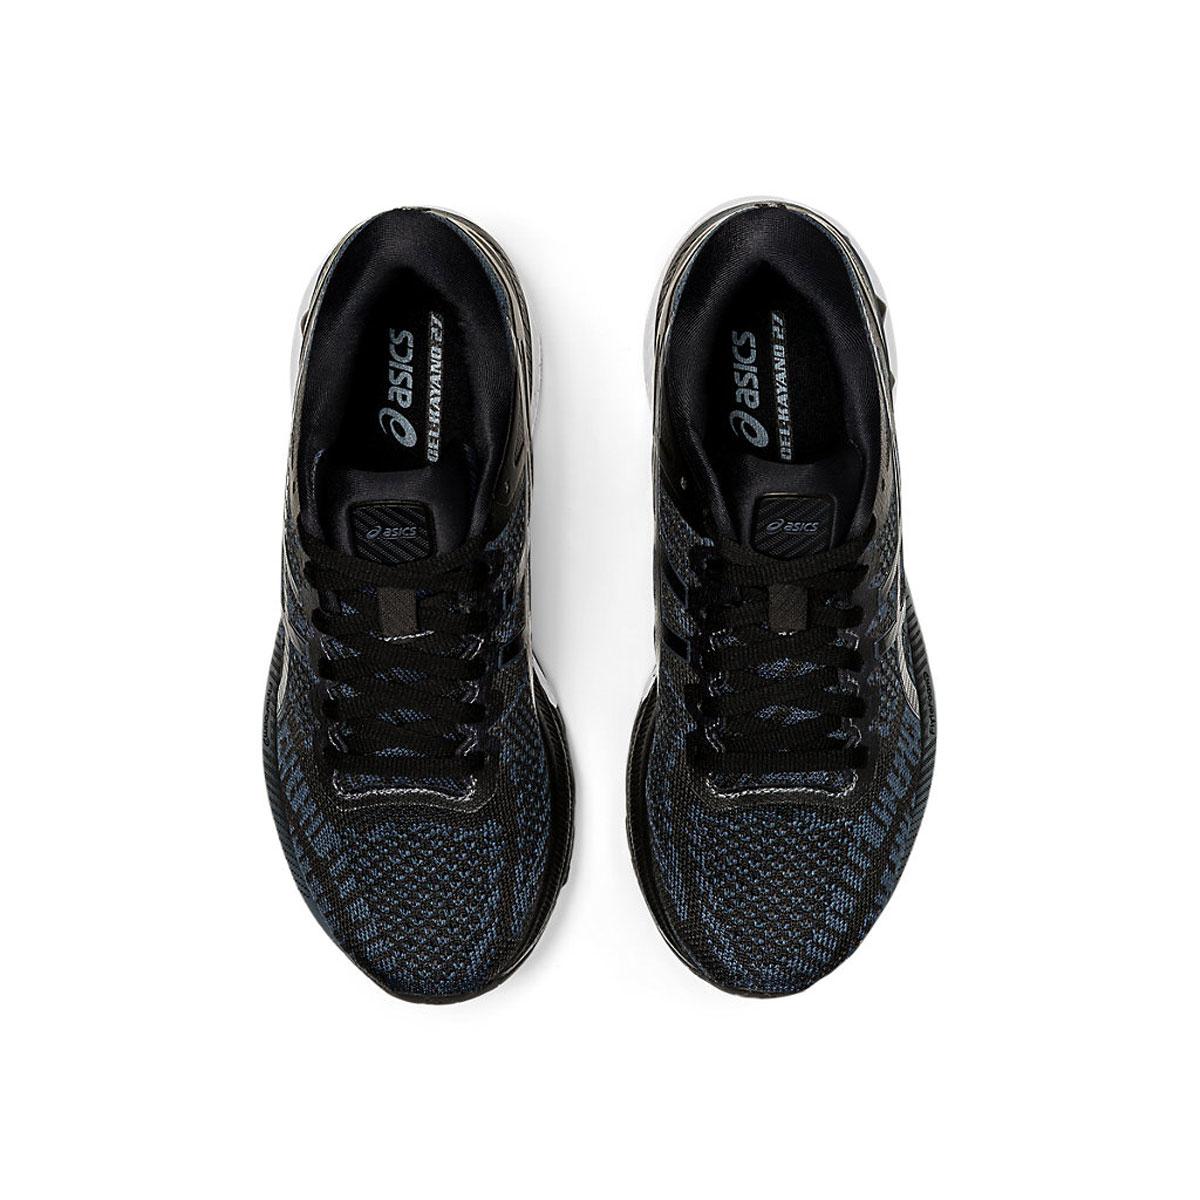 Women's Asics GEL-Kayano 27 Running Shoe - Color: Black/Pure Silv (Regular Width) - Size: 5, Black/Pure Silv, large, image 6